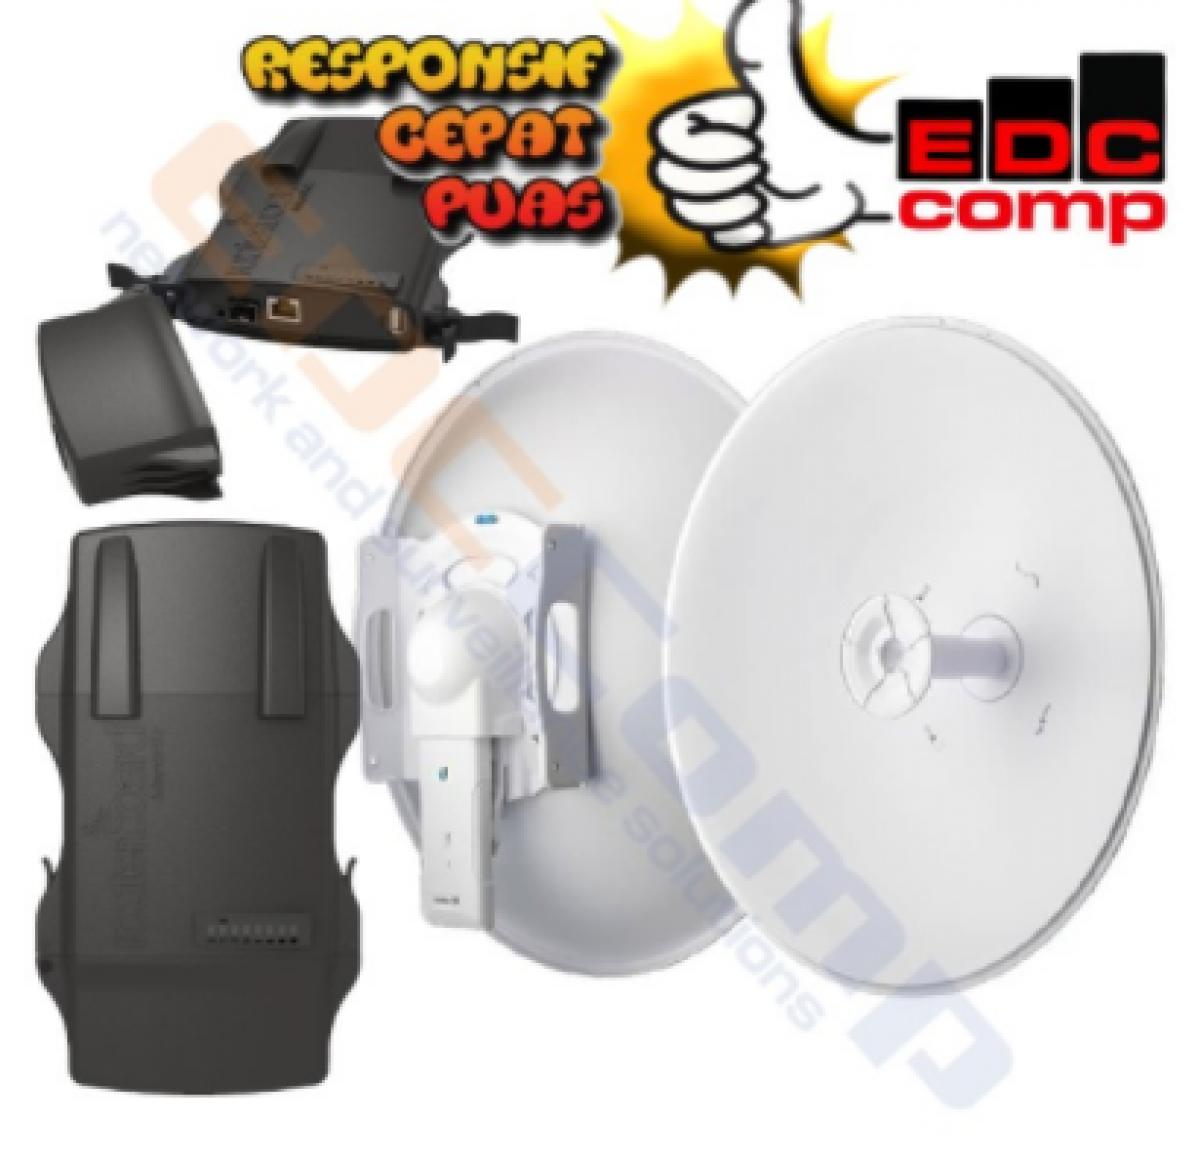 Paket MikroTik Netmetal / RB921UAGS-5SHPacD-NM + RD-5G30-LW - EdcComp